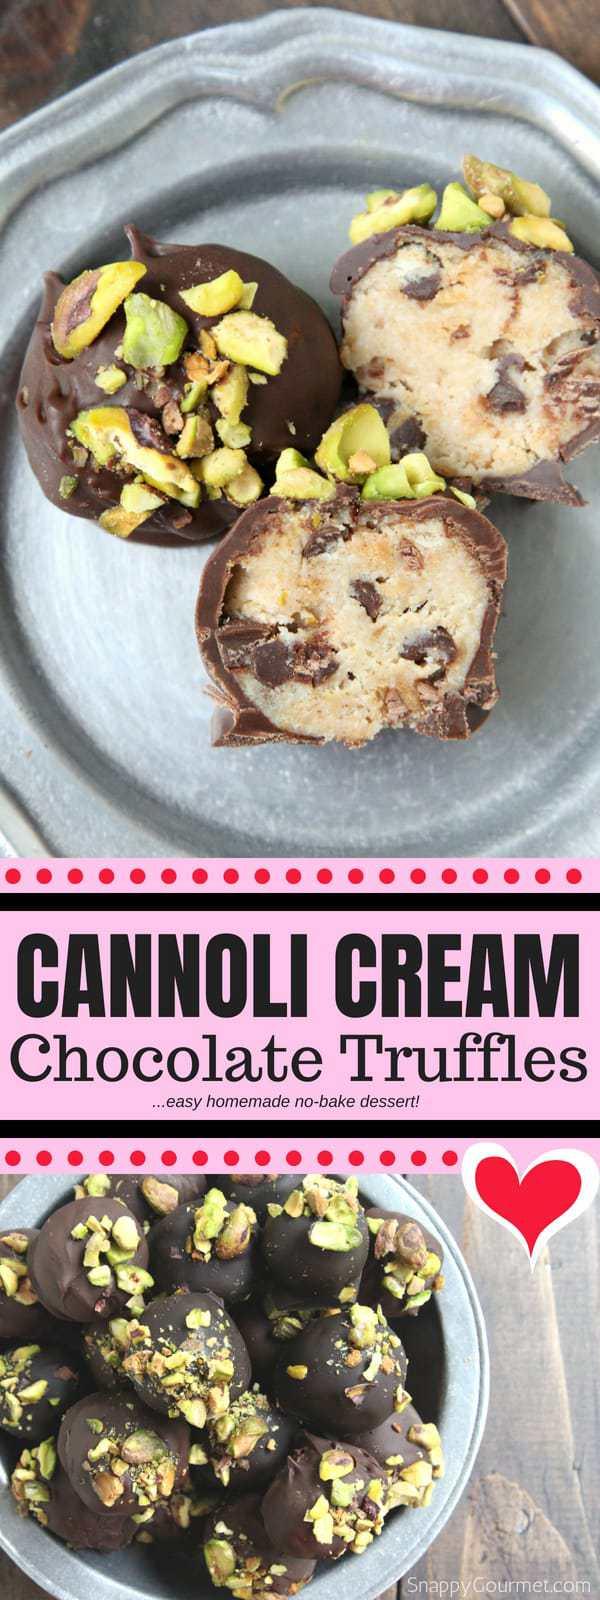 Nut Dessert Recipes: Cannoli Cream Chocolate Truffles Recipe